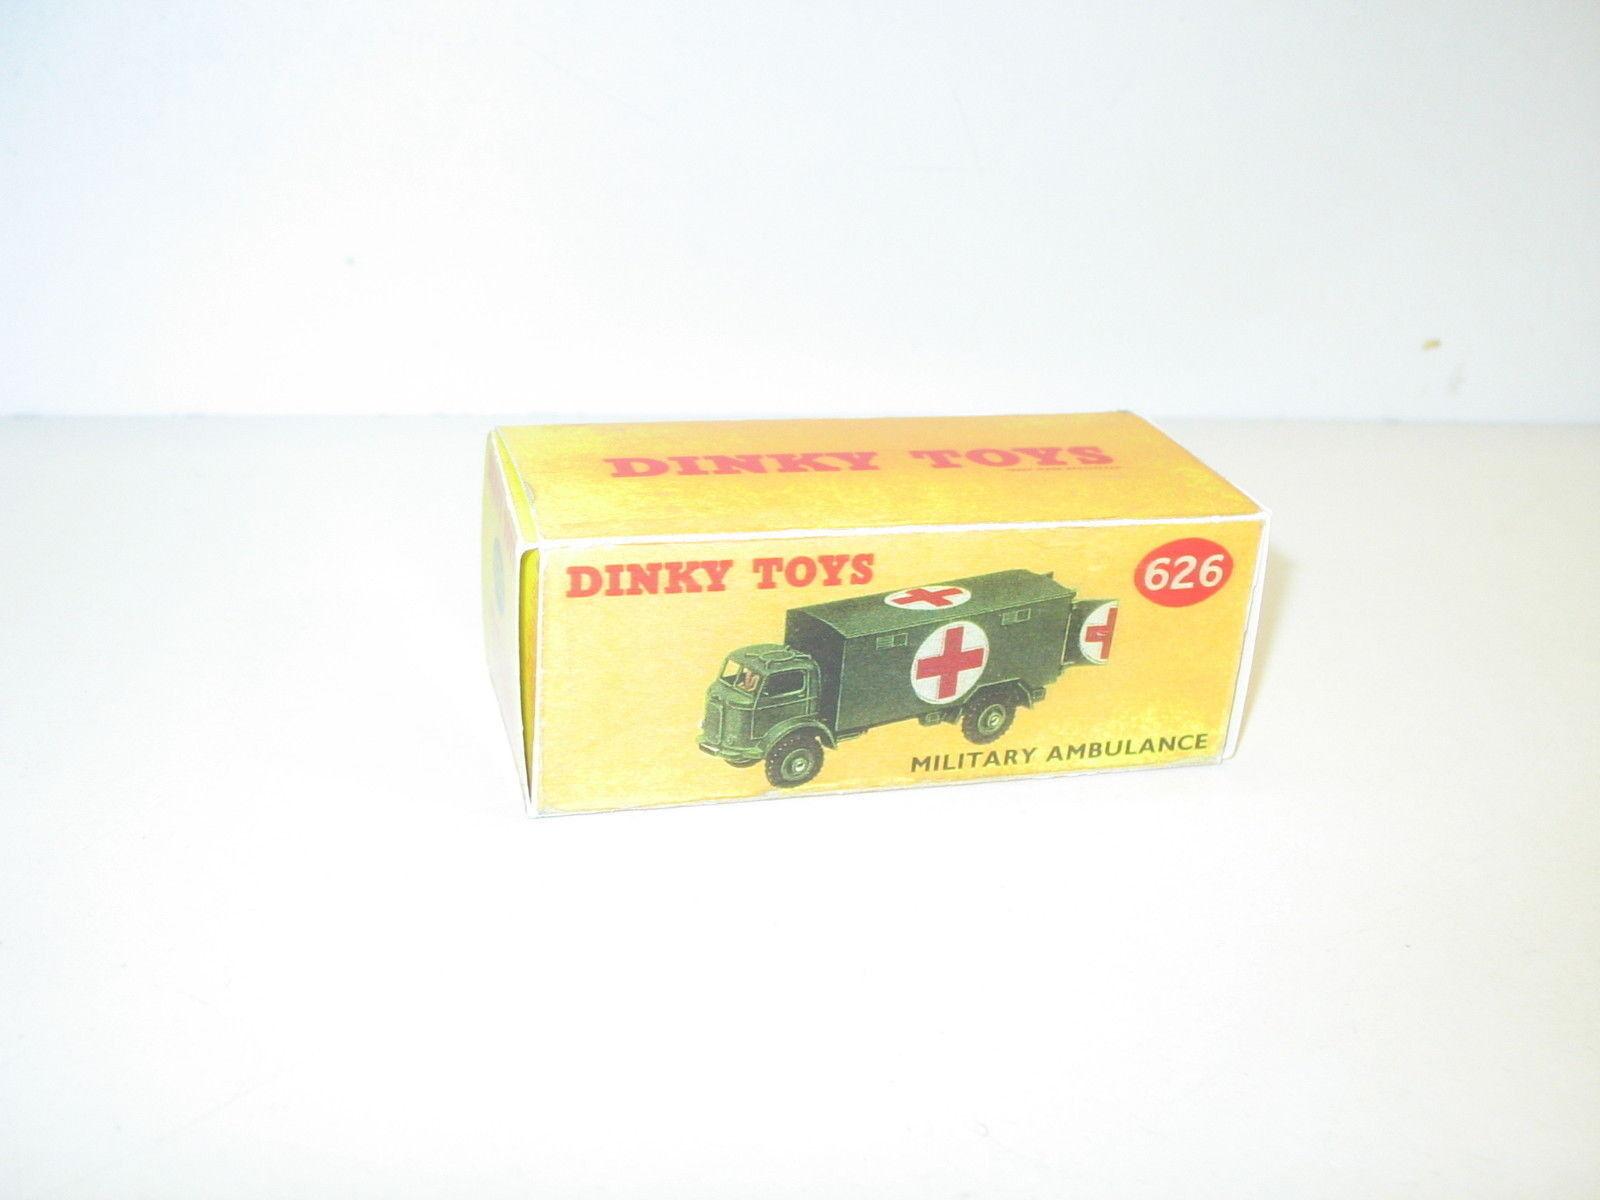 N54 Schachtel Lastwagen Commer Ambulanz Militär, REPRO Dinky Toys Ref. 626